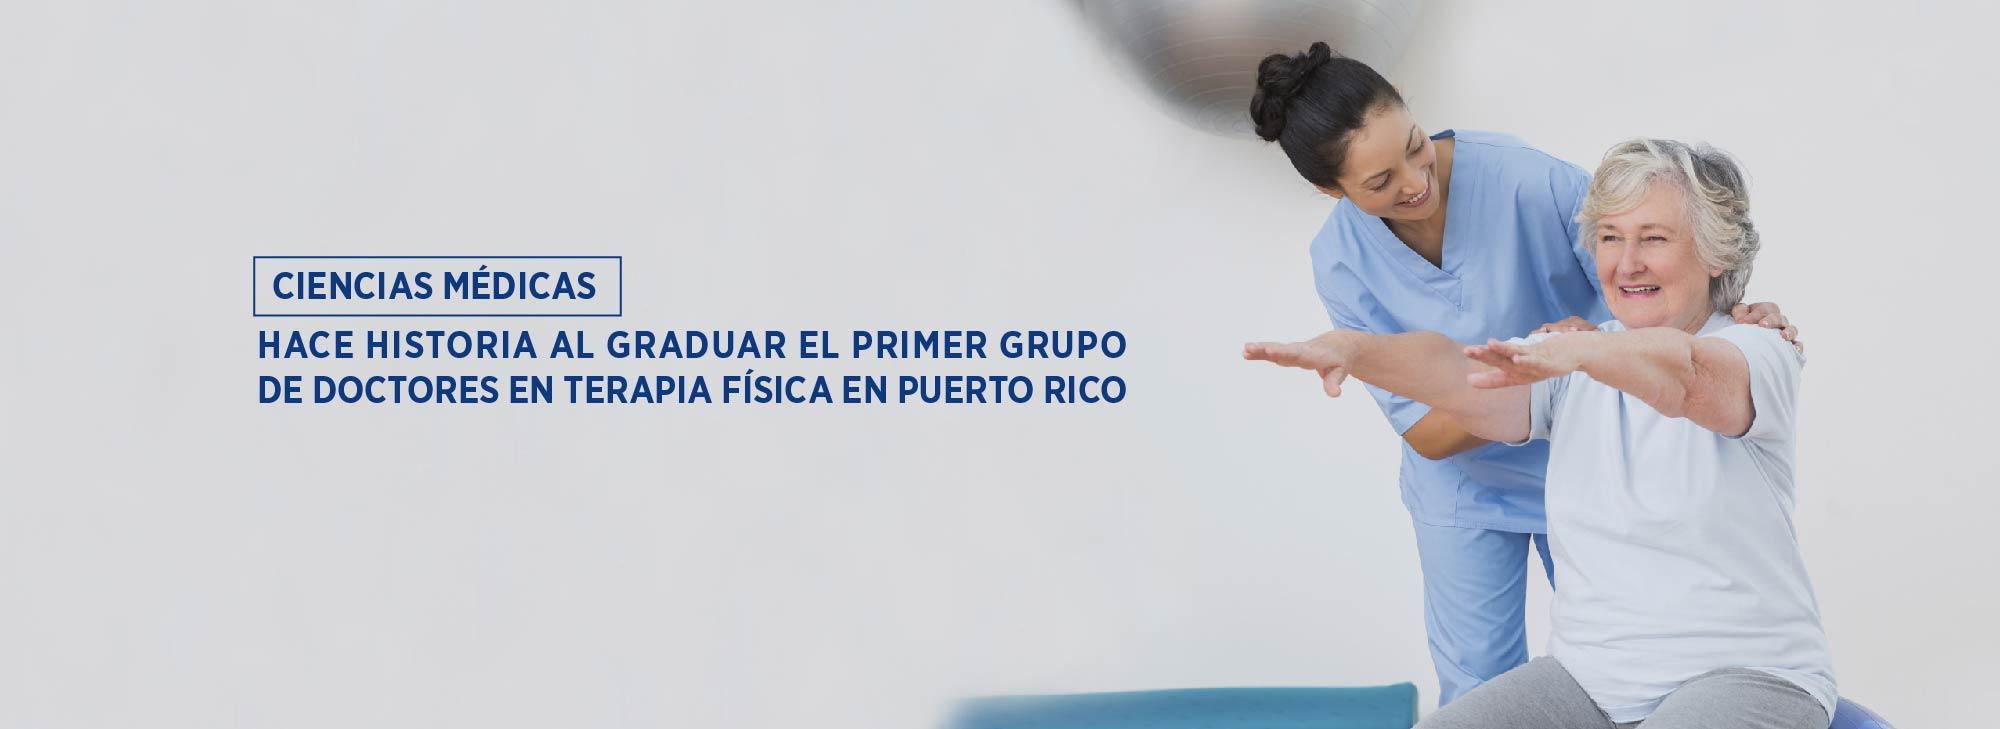 slider-terapia-fisica-rcm-01